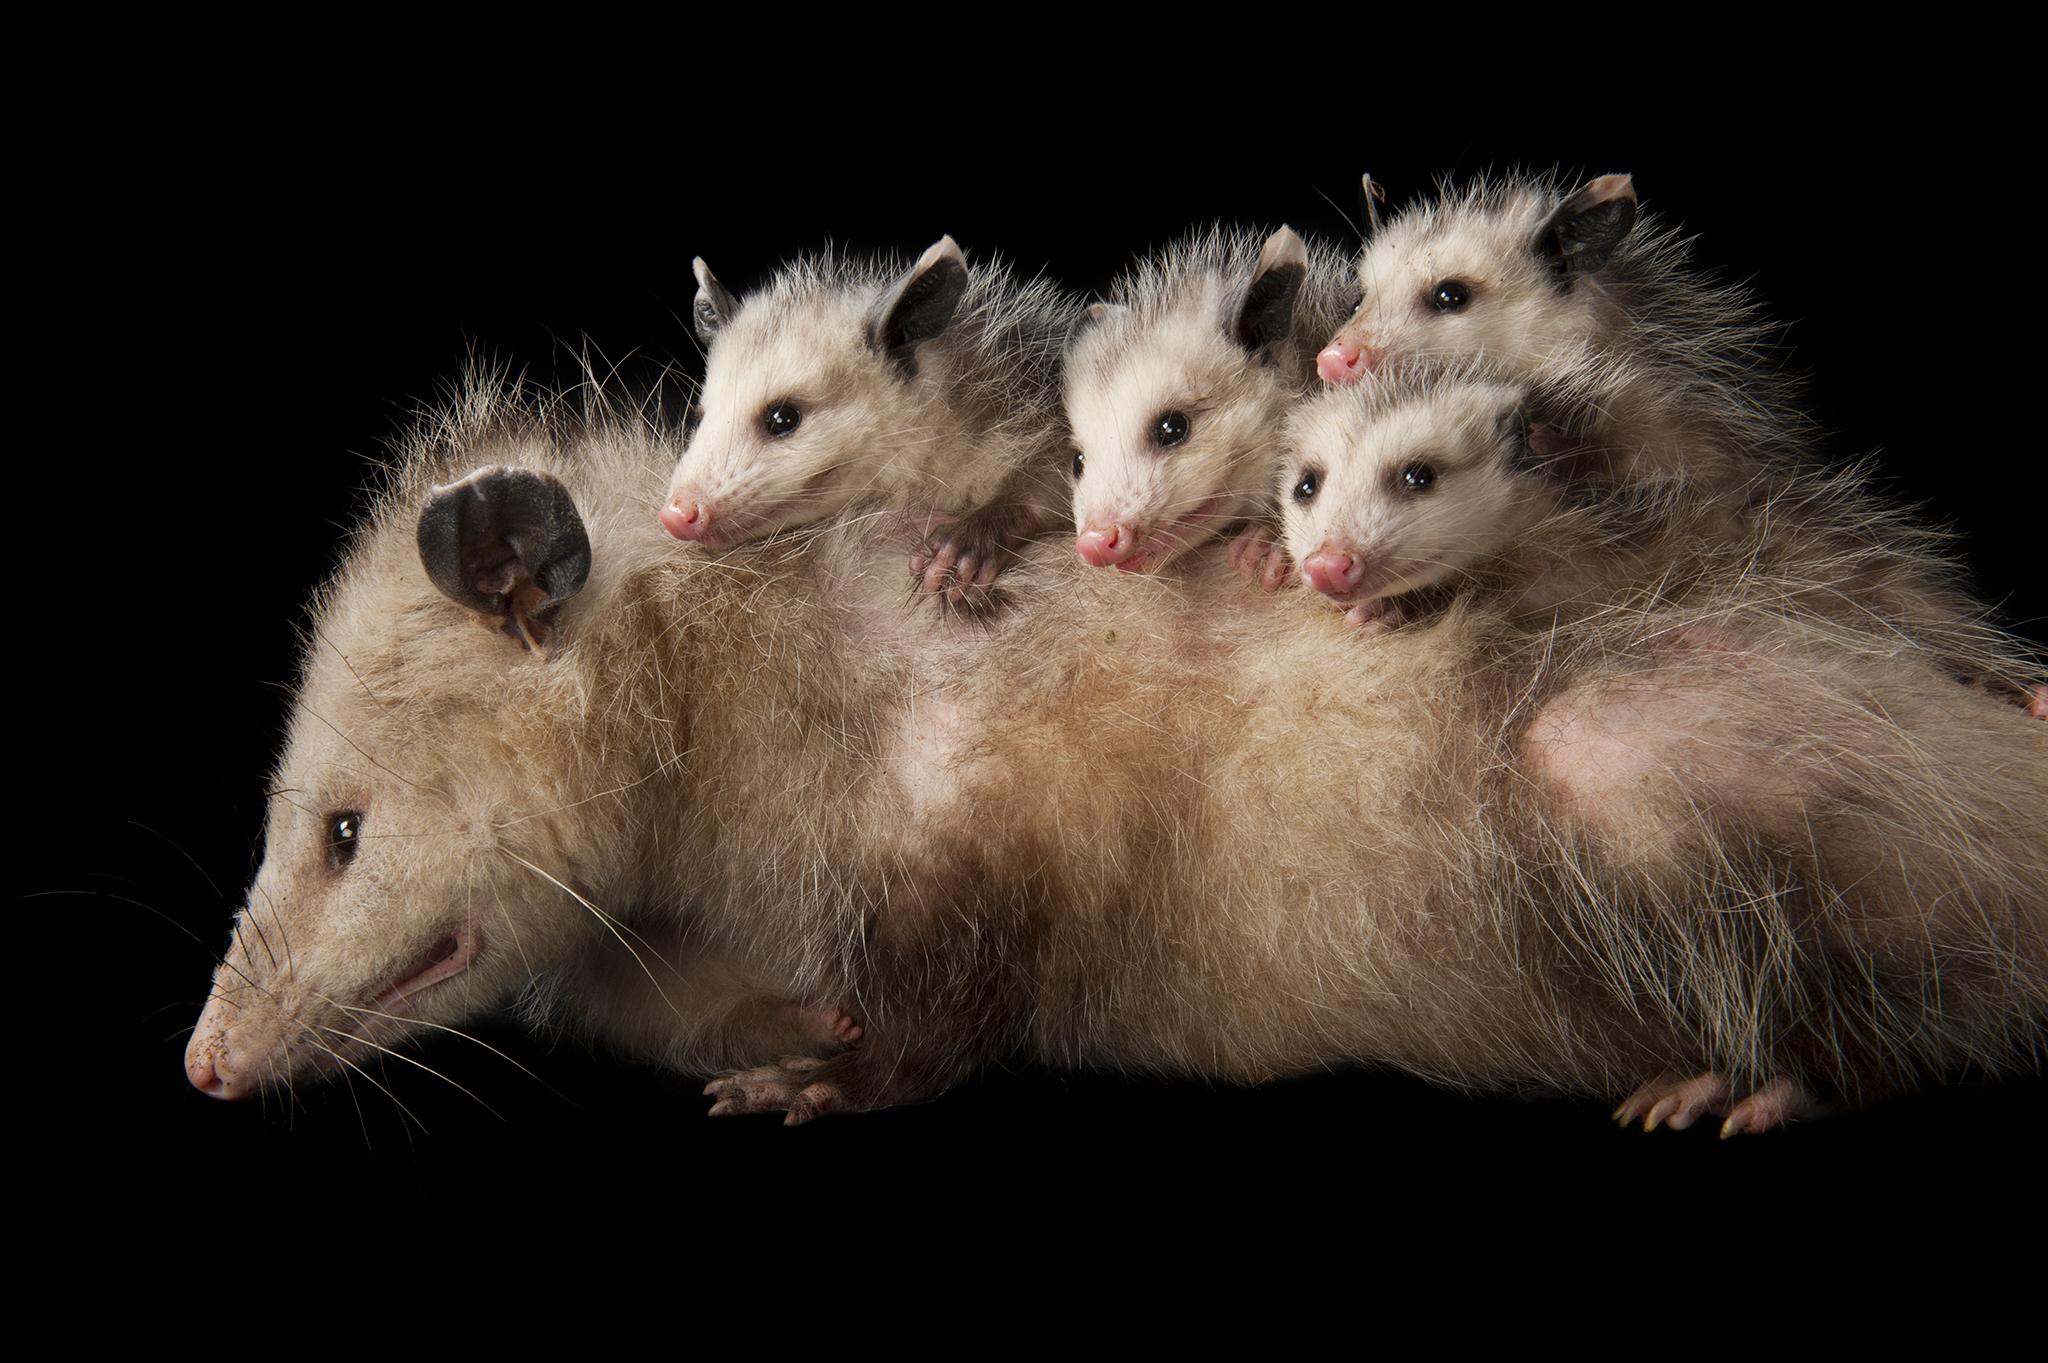 Opossum Backgrounds on Wallpapers Vista